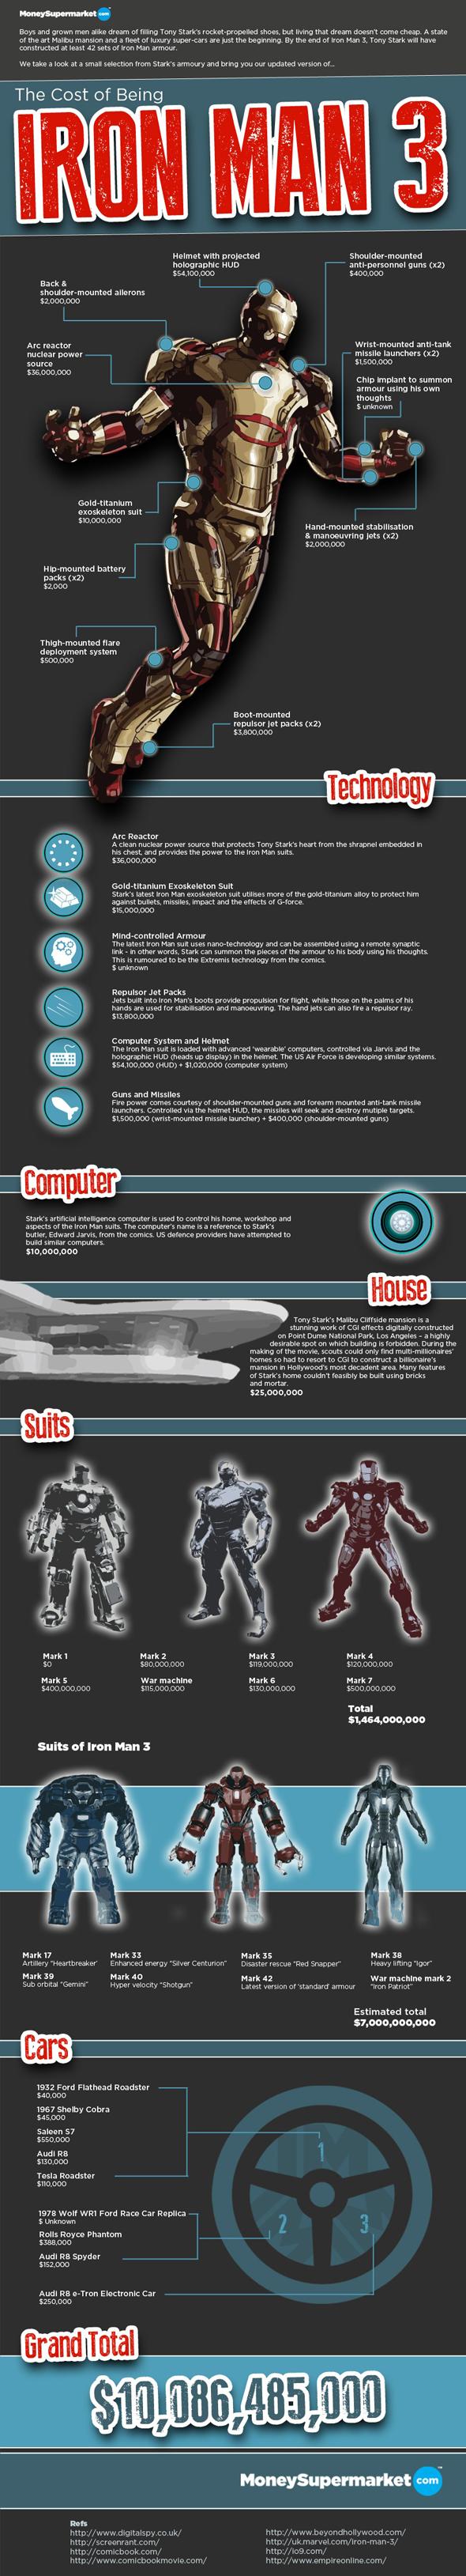 Iron Man infographic